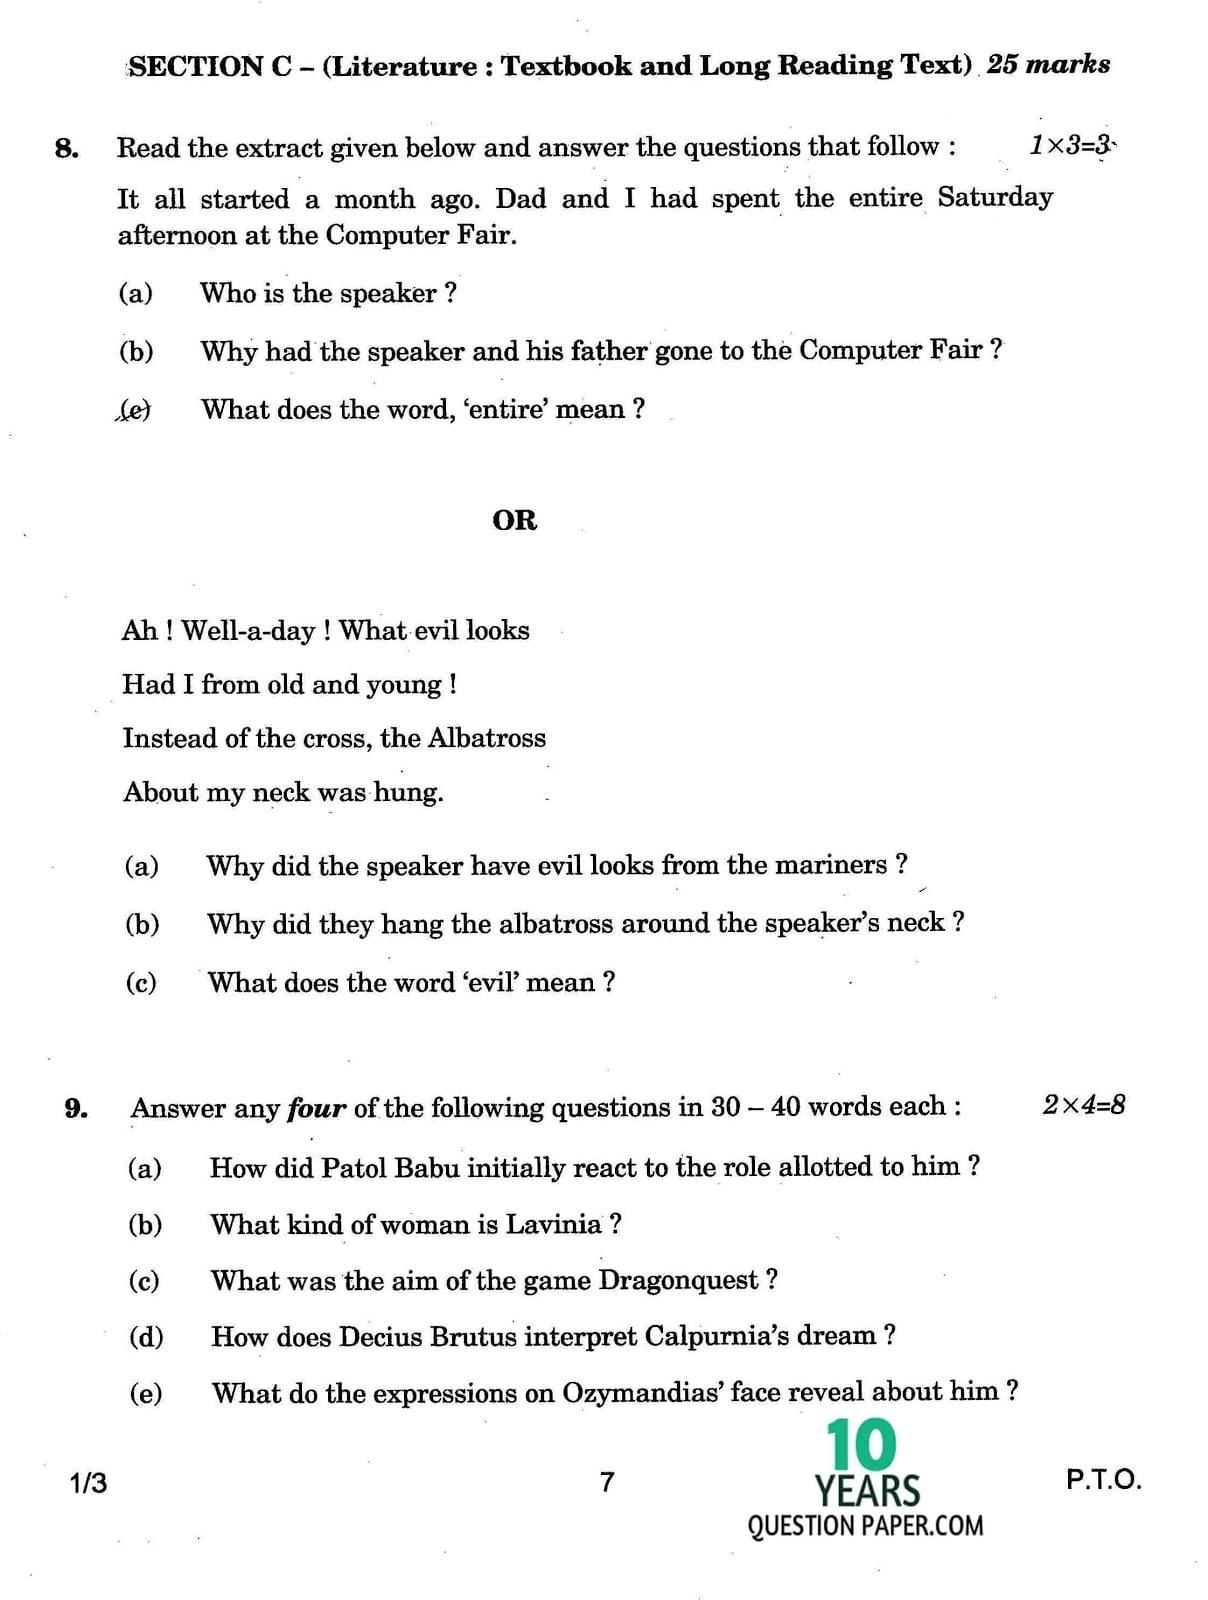 CBSE Class 10 English Communicative 2017 Question Paper